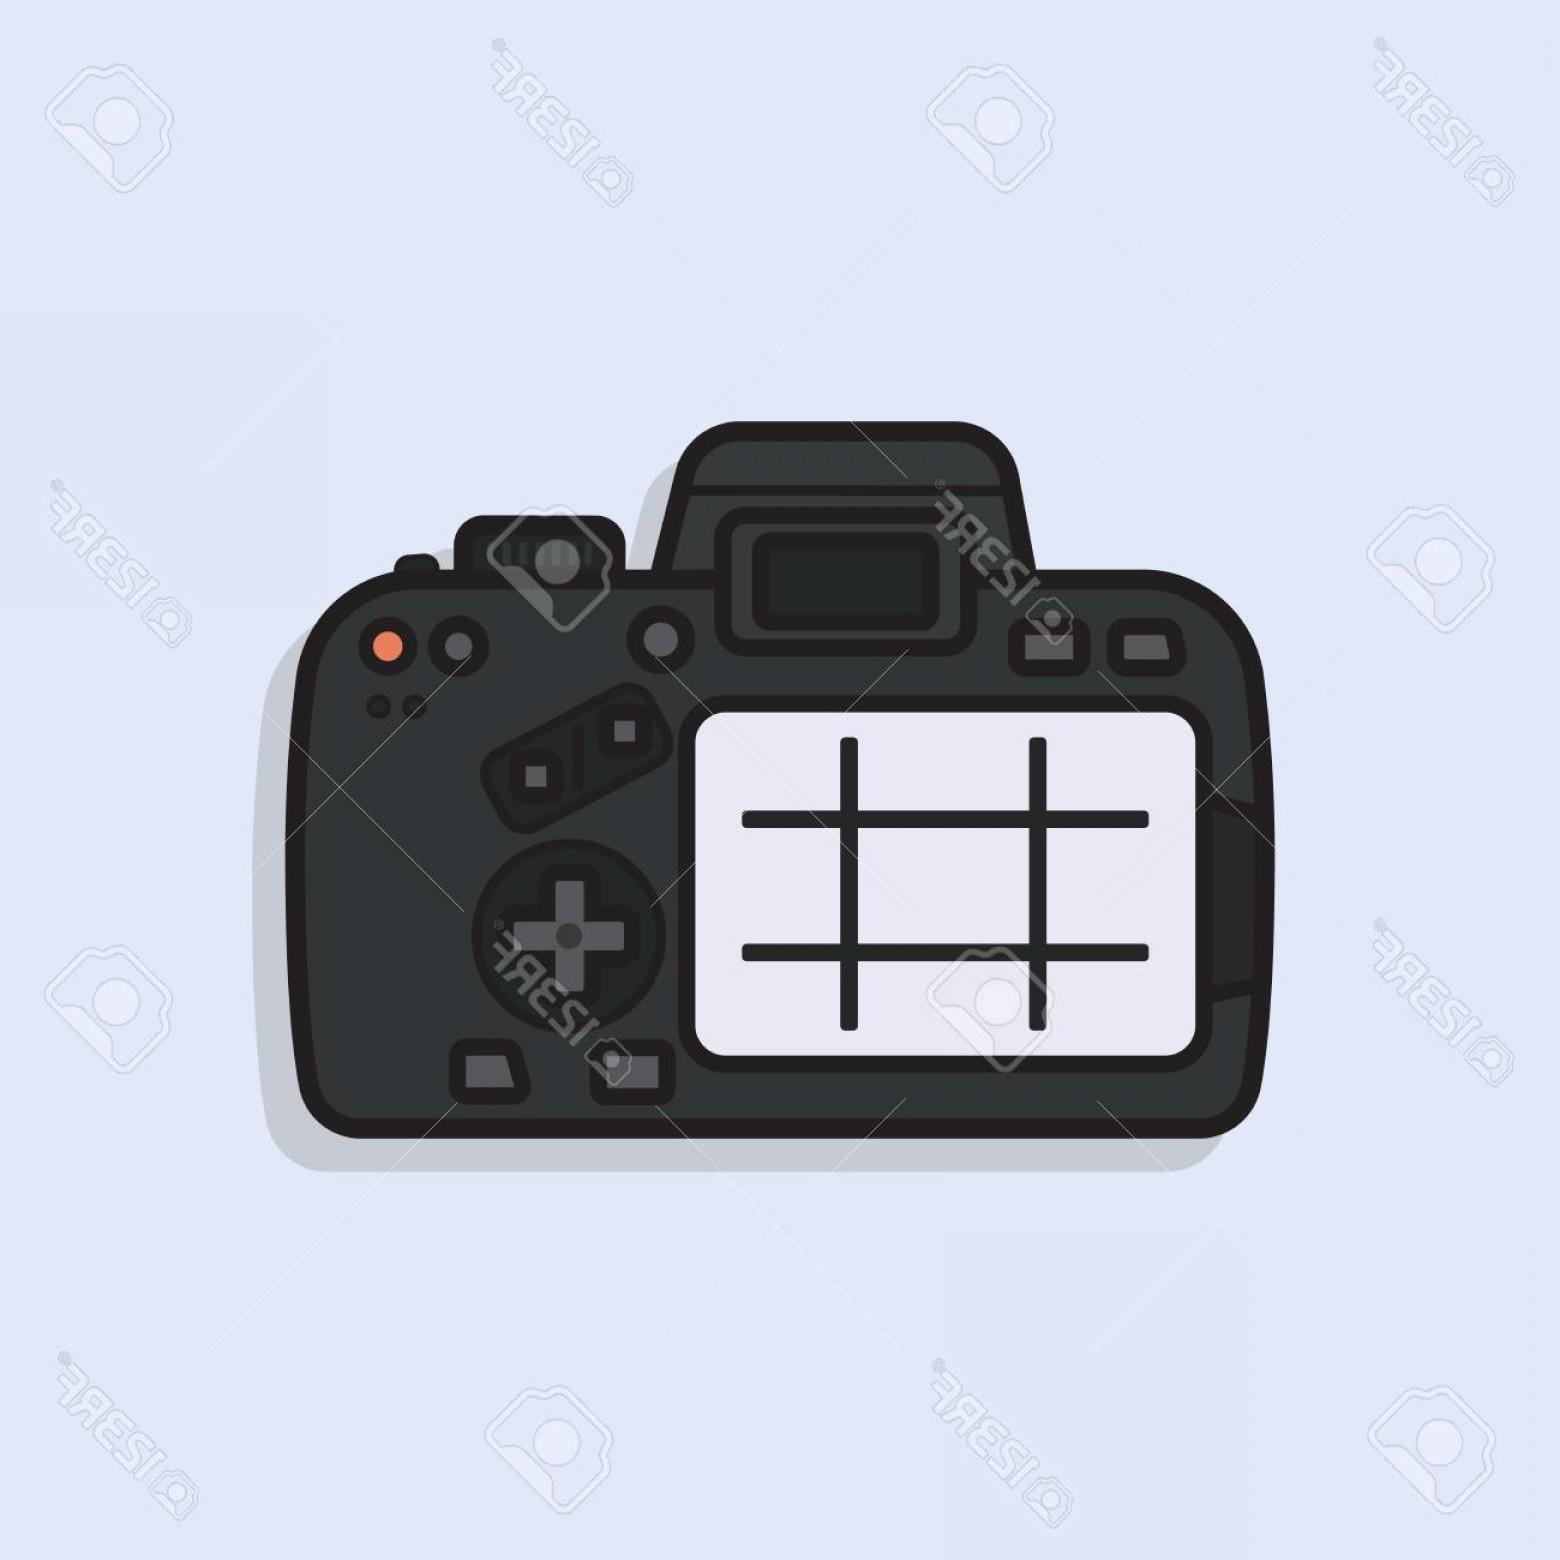 1560x1560 Photostock Vector Dslr Camera Vector Illustration Back Side With